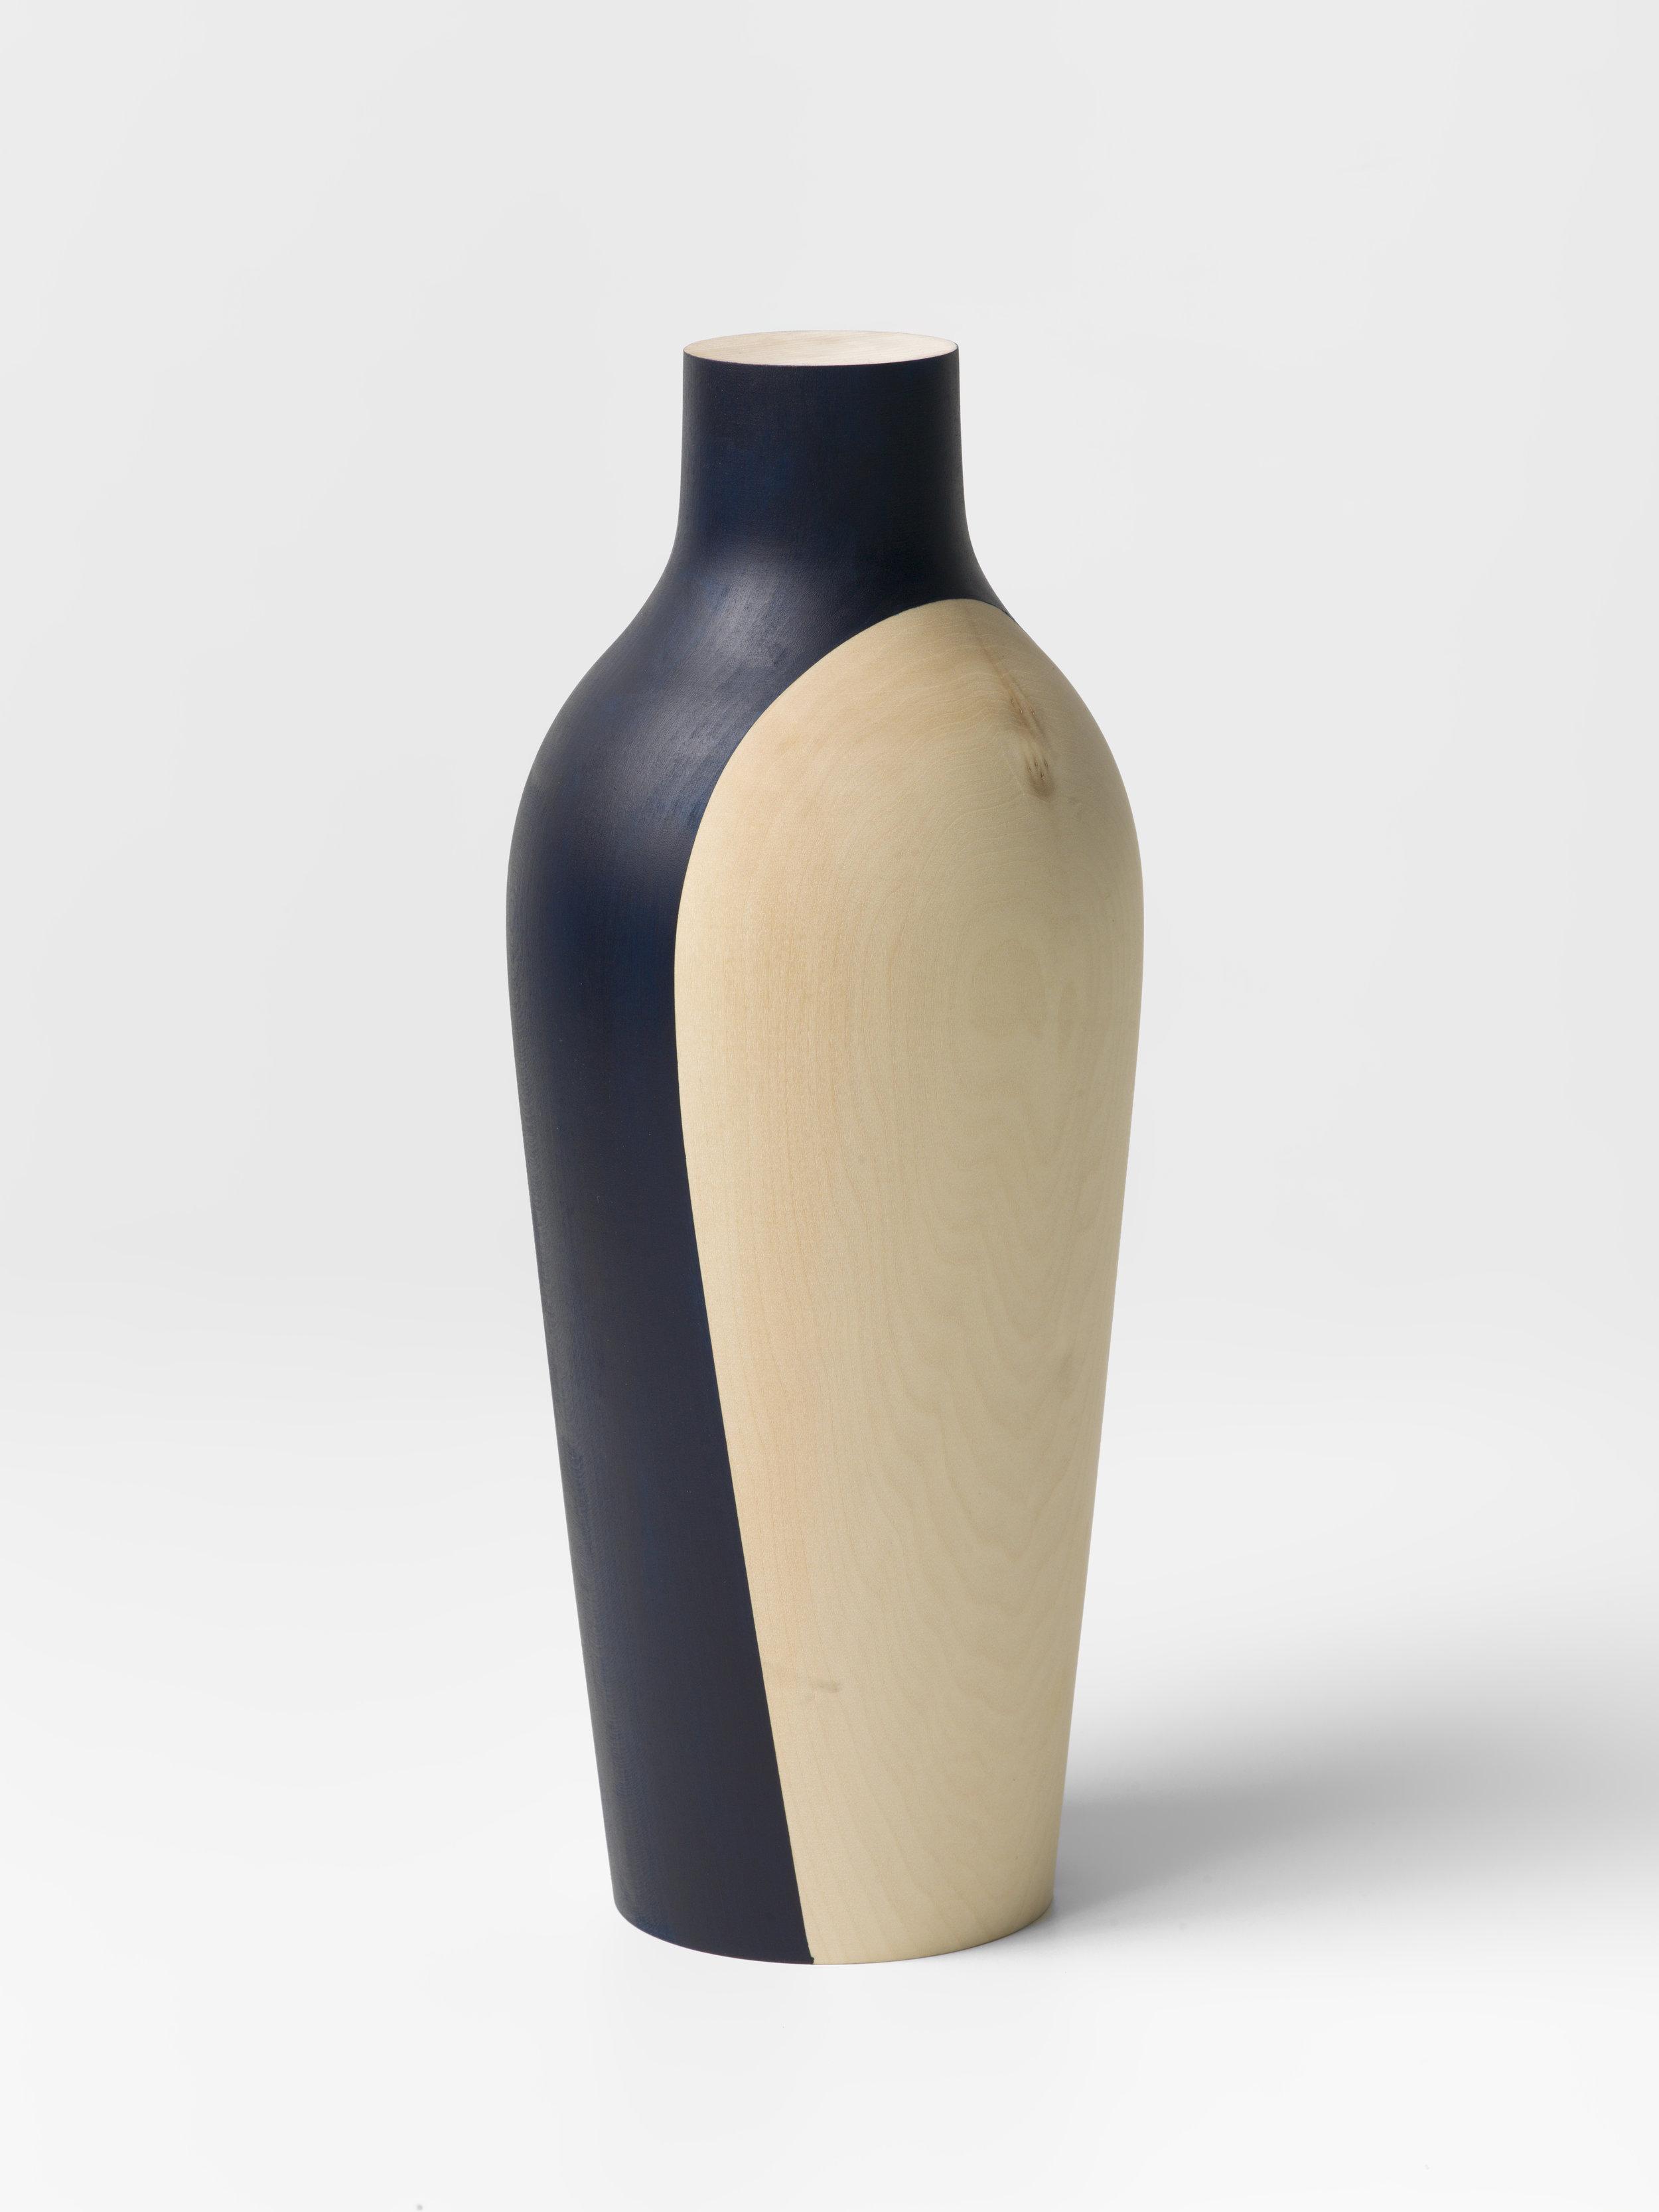 Claudia Wieser  Untitled , 2017 acrylic on wood, 42 x 12 cm